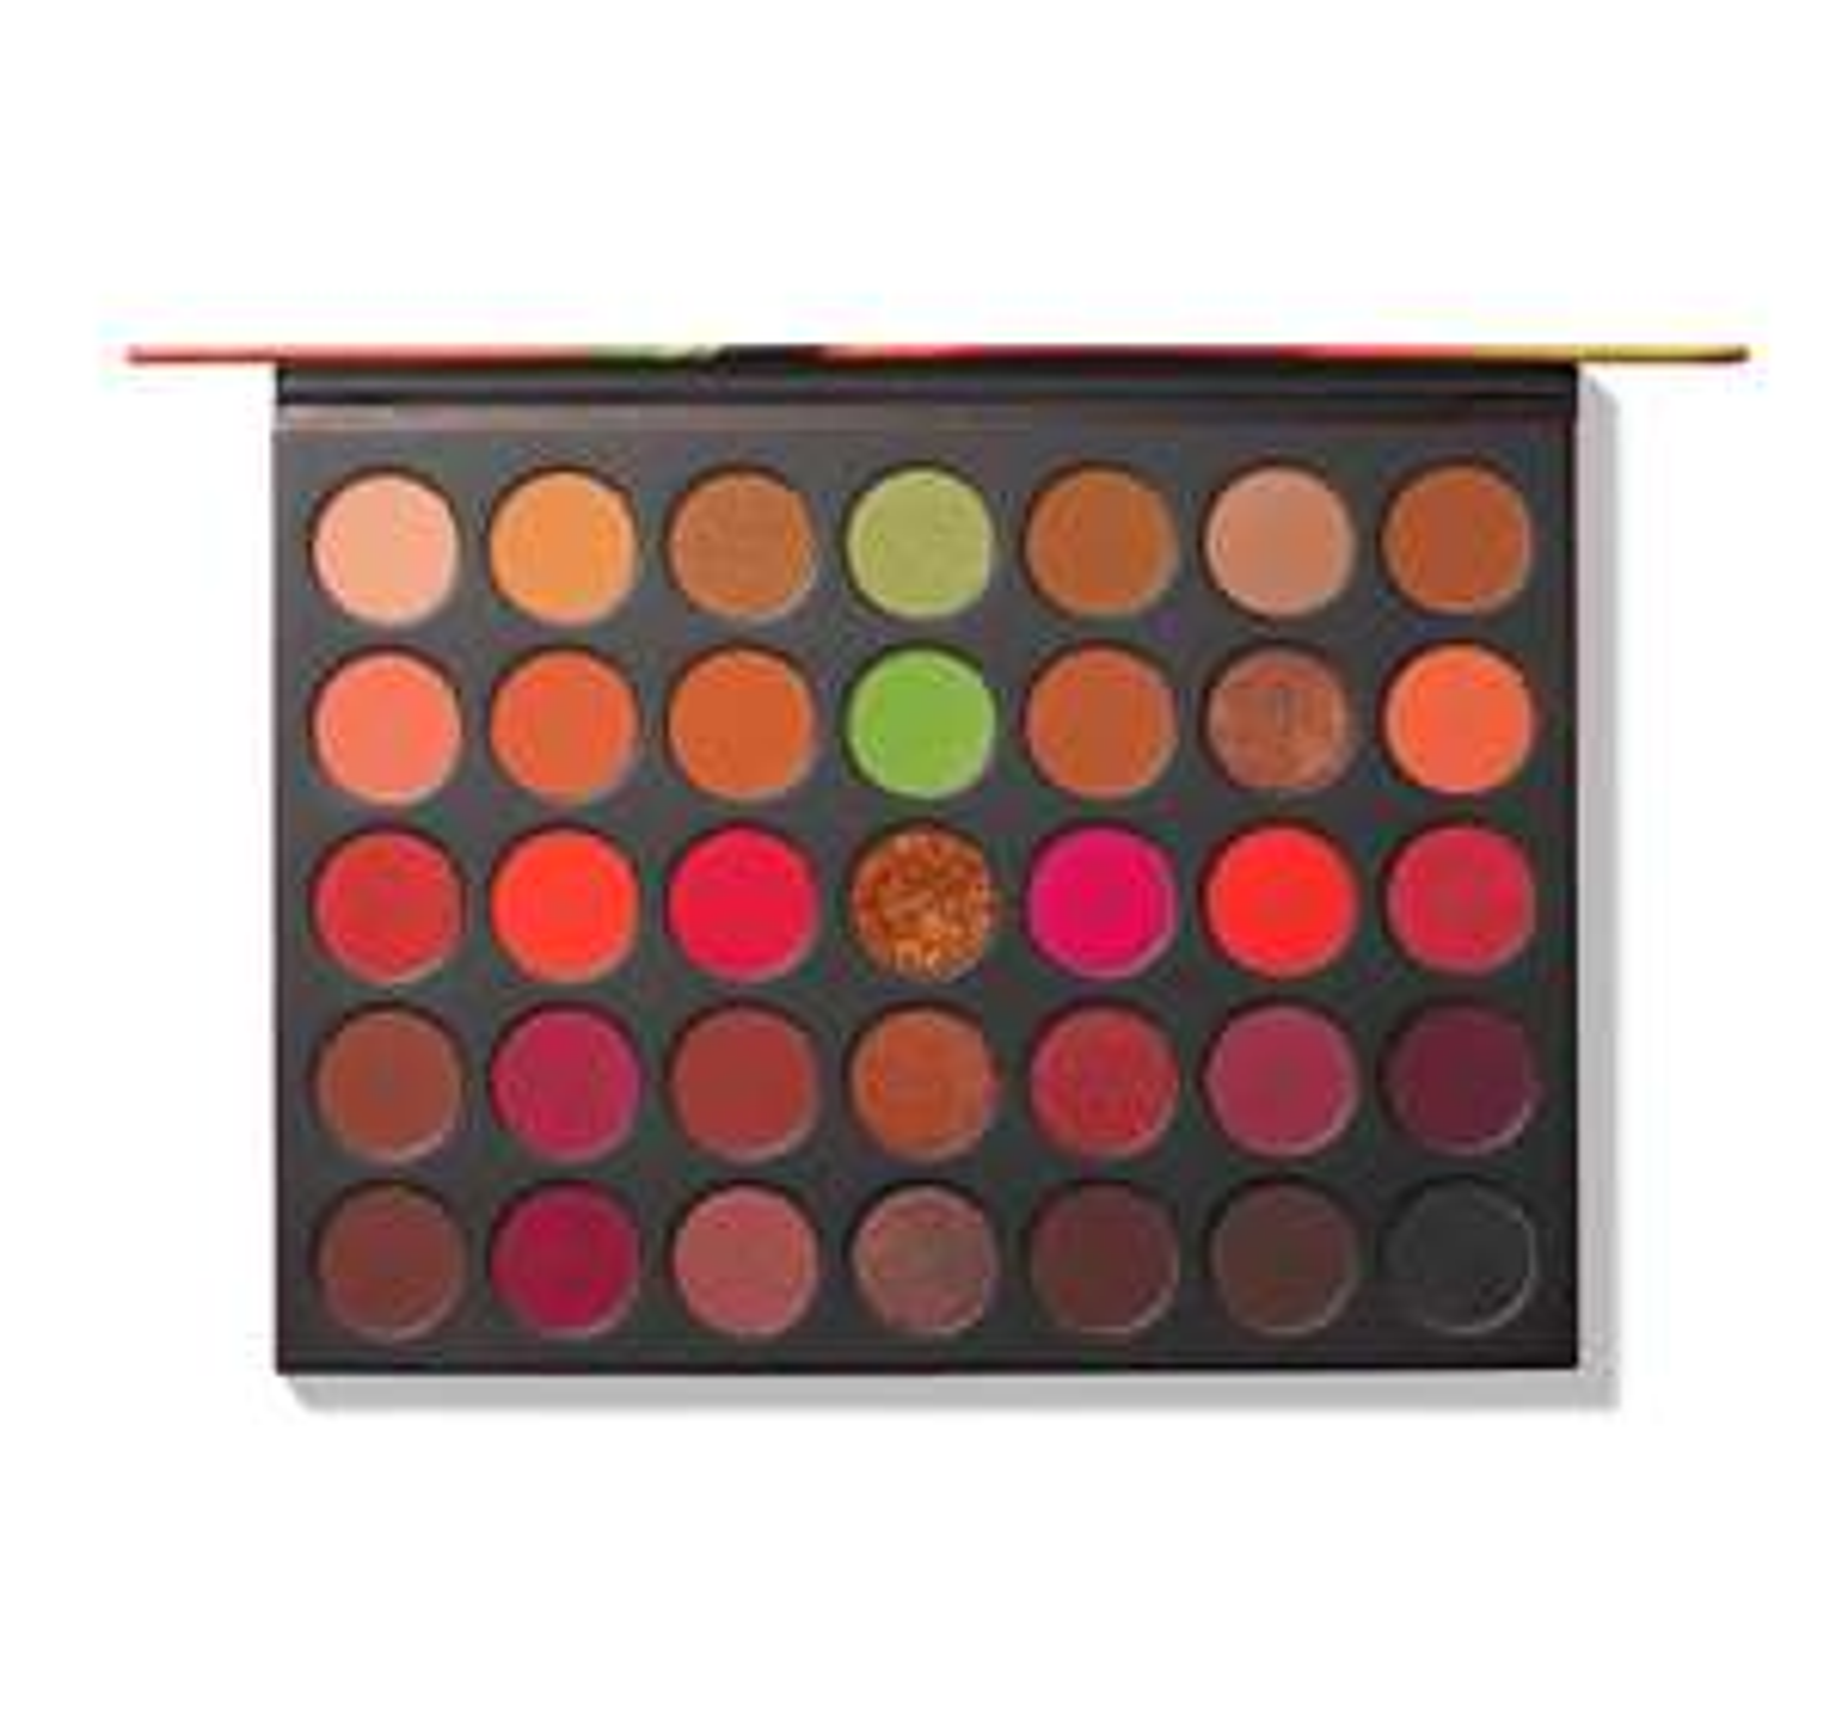 Morphe 3503 palette £14 @ Morphe (£5 P&P)